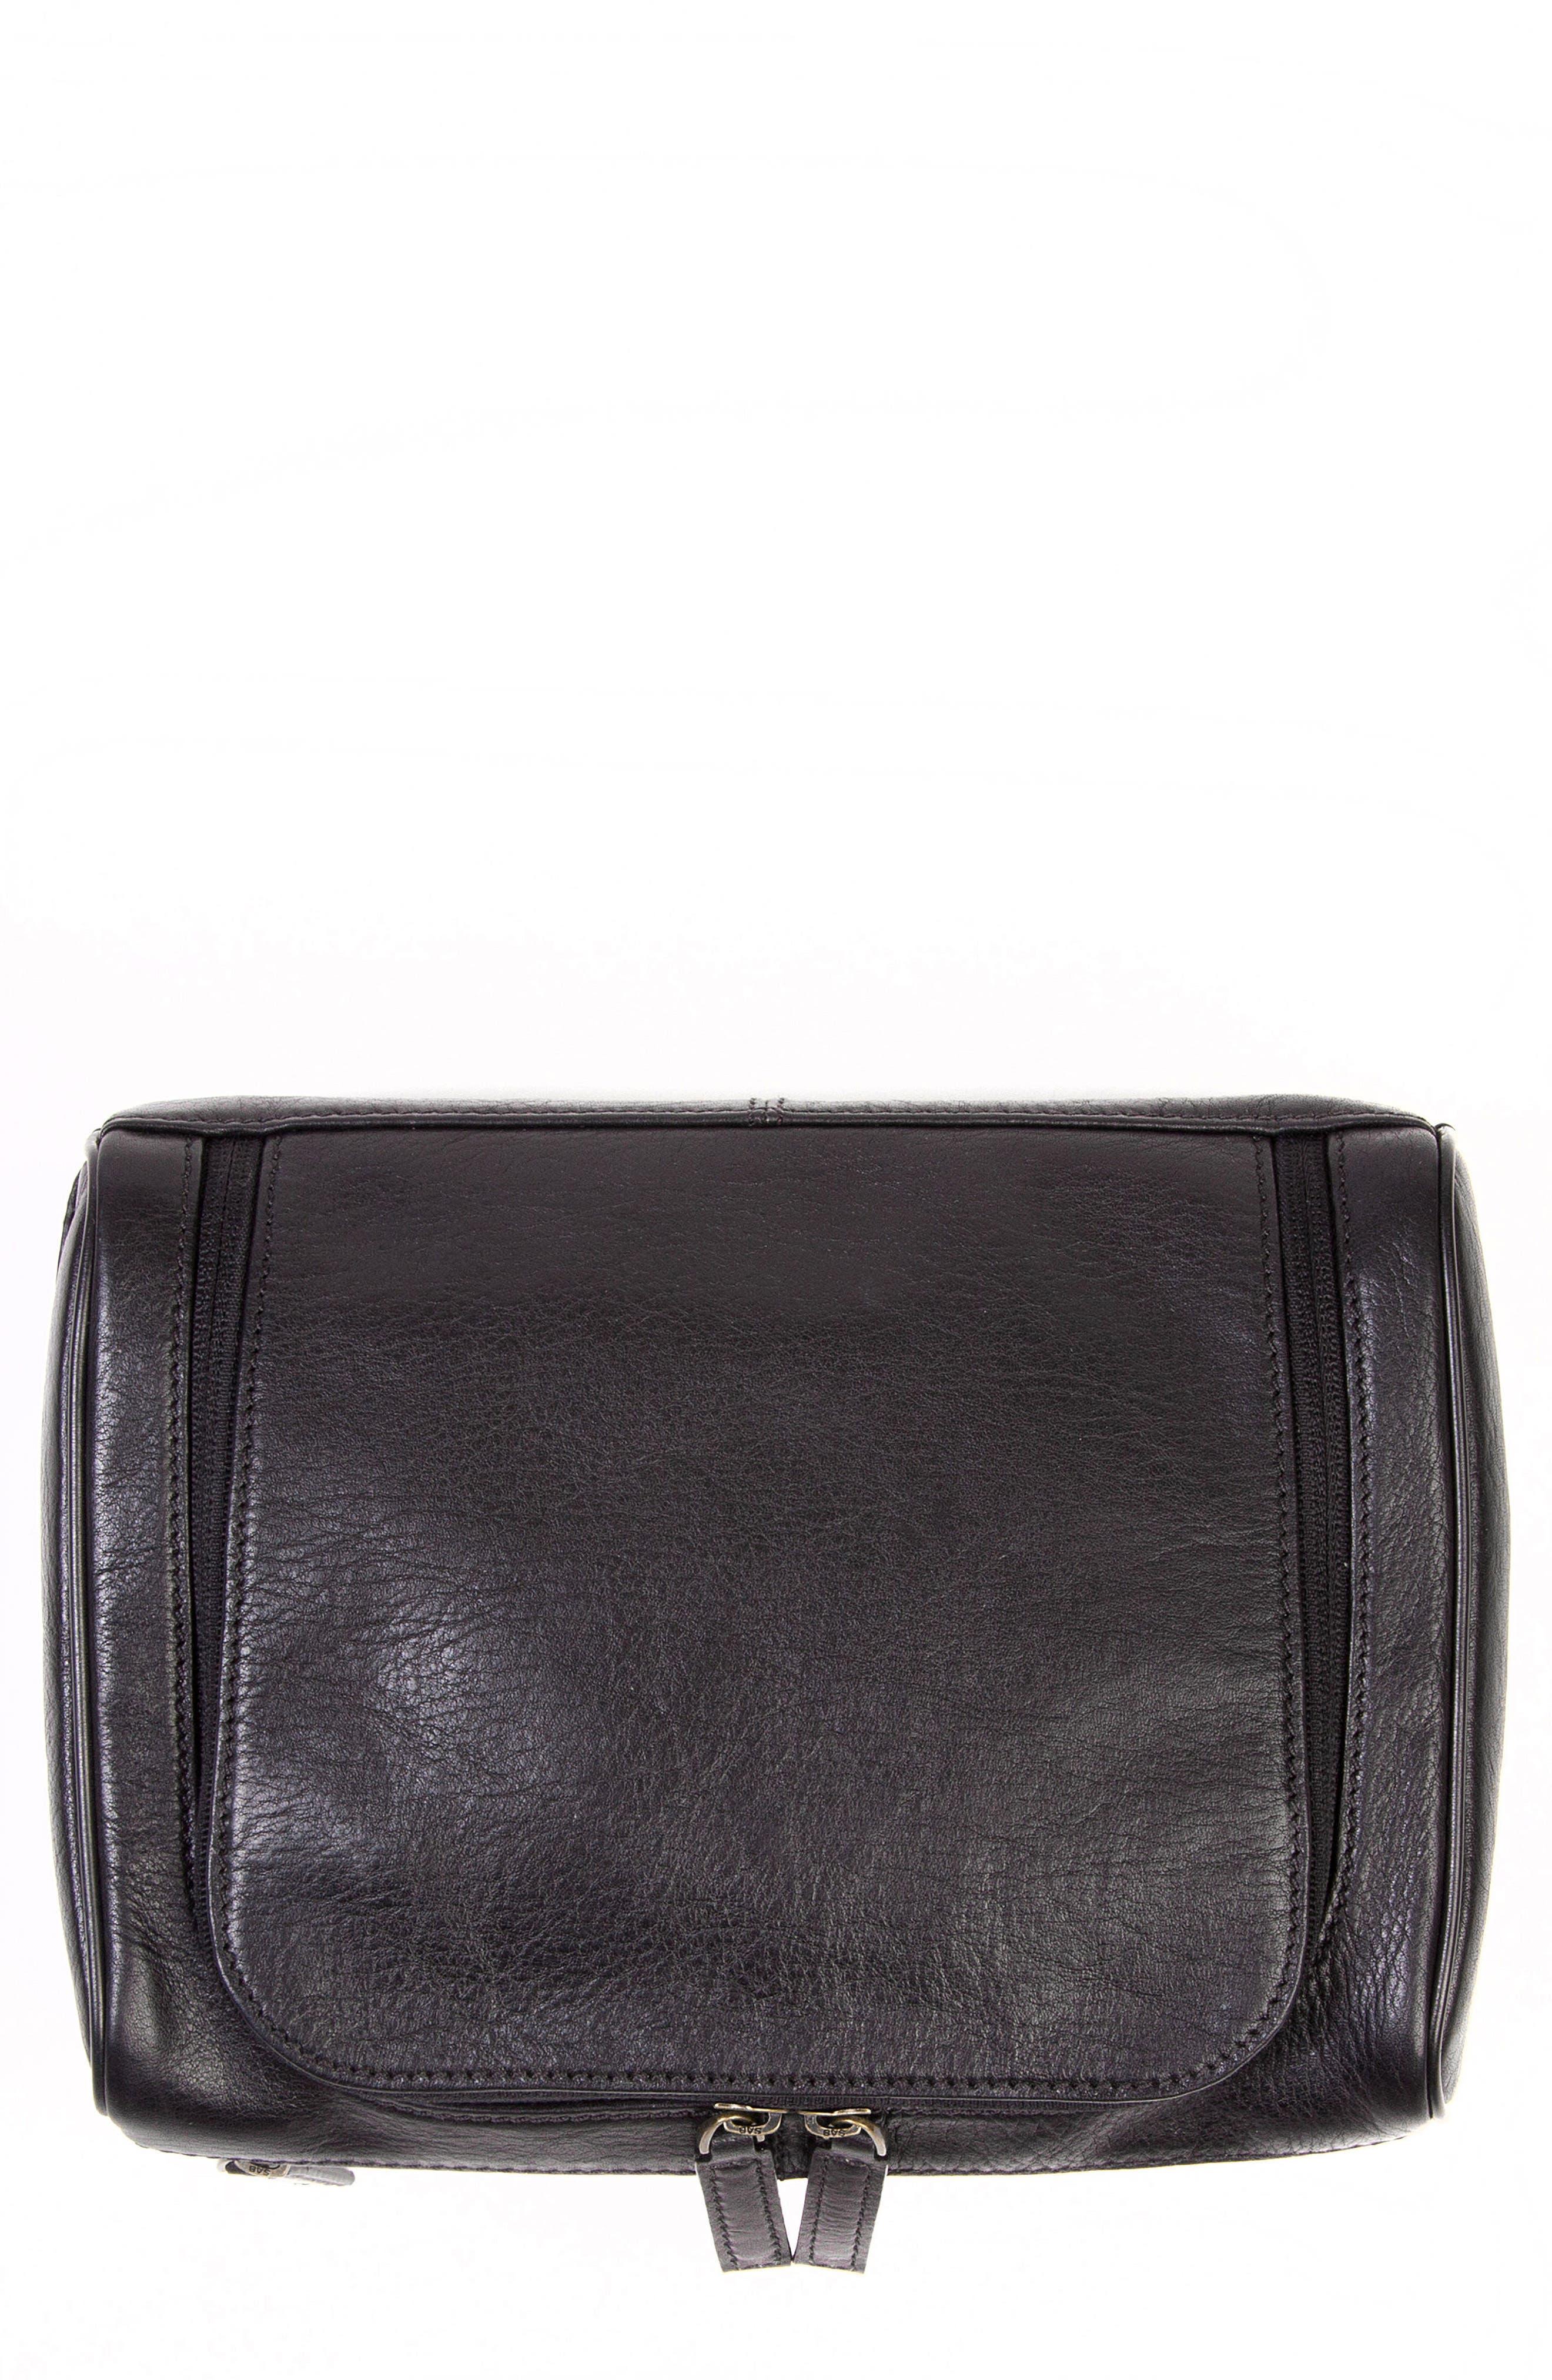 Becker Leather Travel Kit,                             Main thumbnail 1, color,                             BLACK